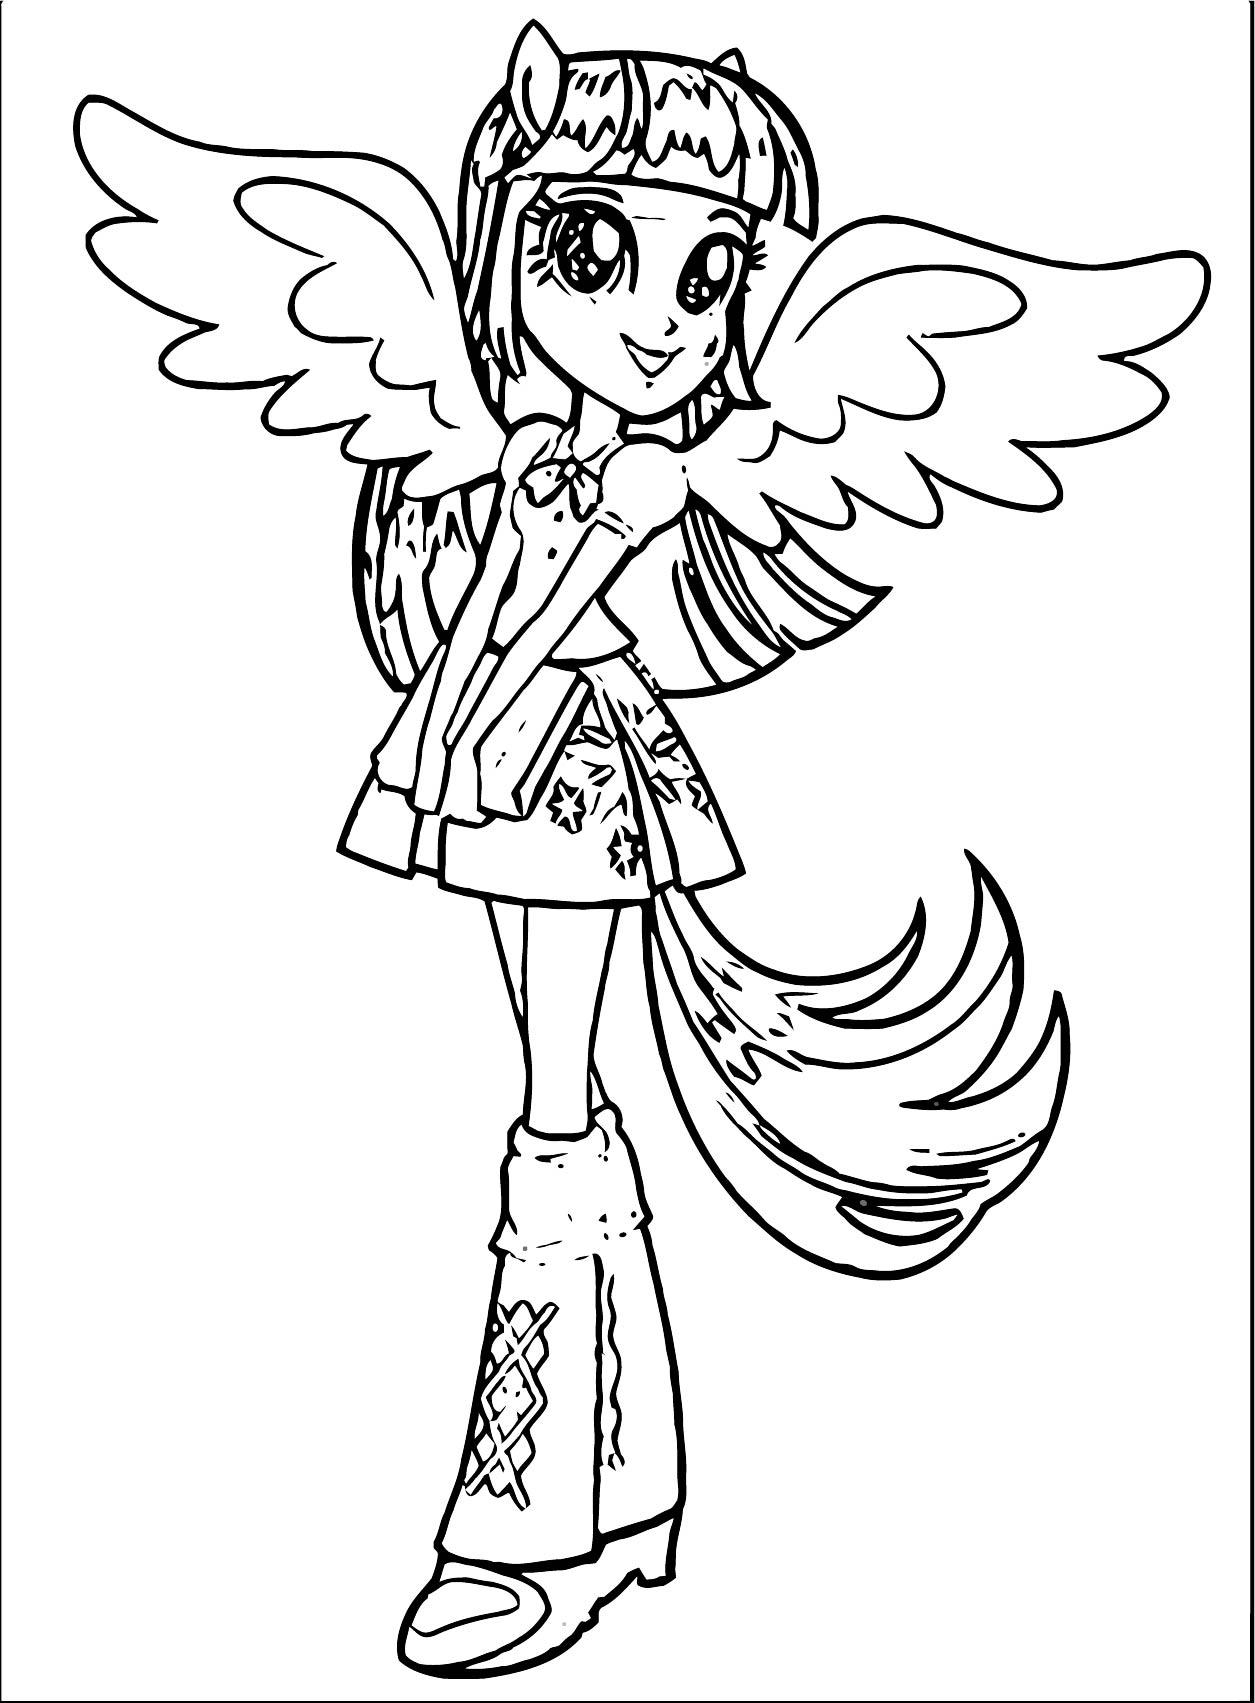 Princess Twilight Sparkle Coloring Page 014